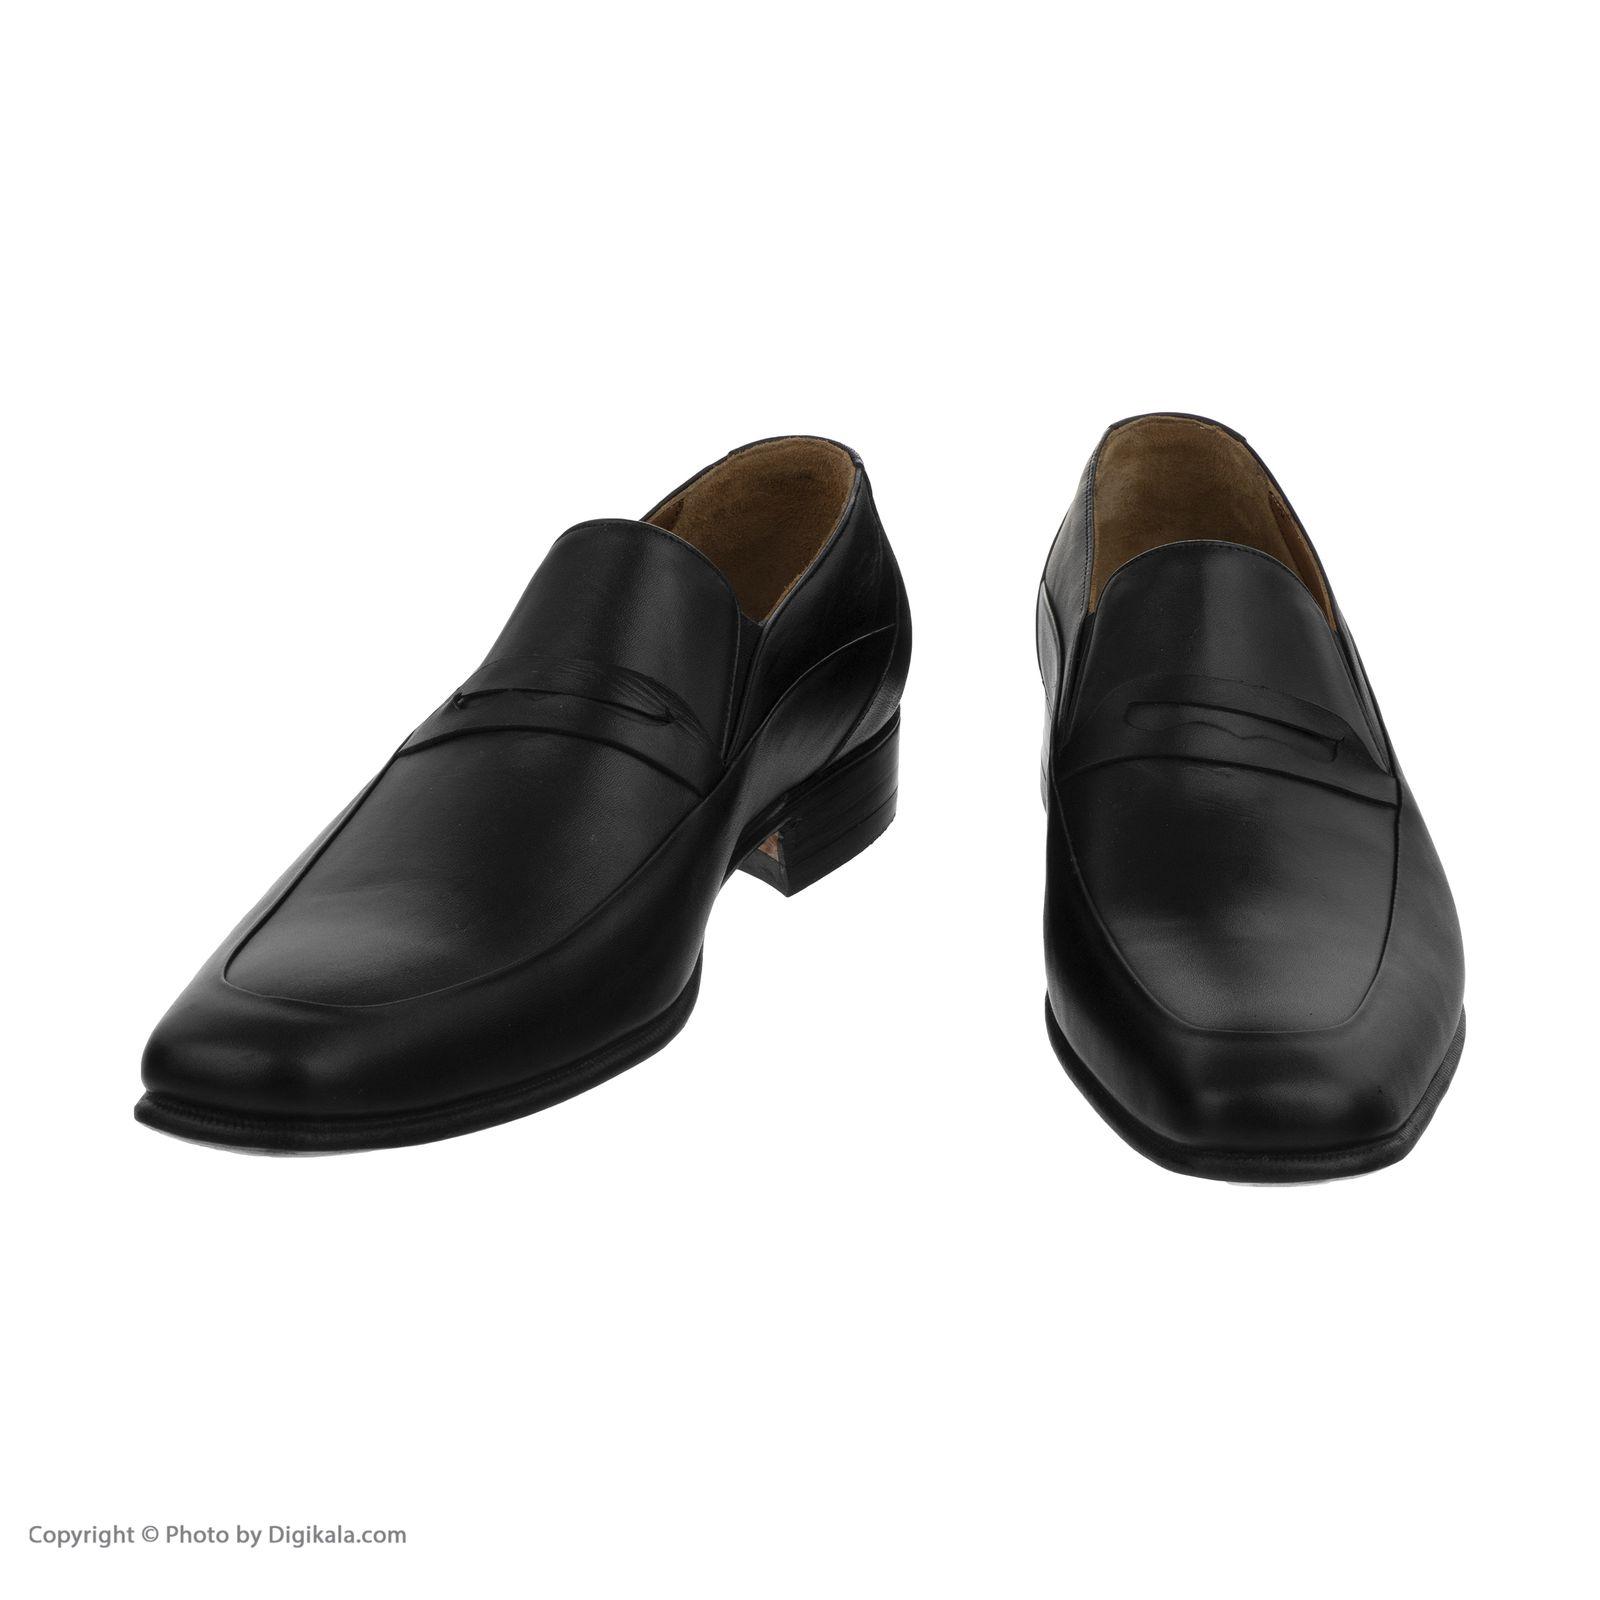 کفش مردانه نظری کد 421 -  - 4